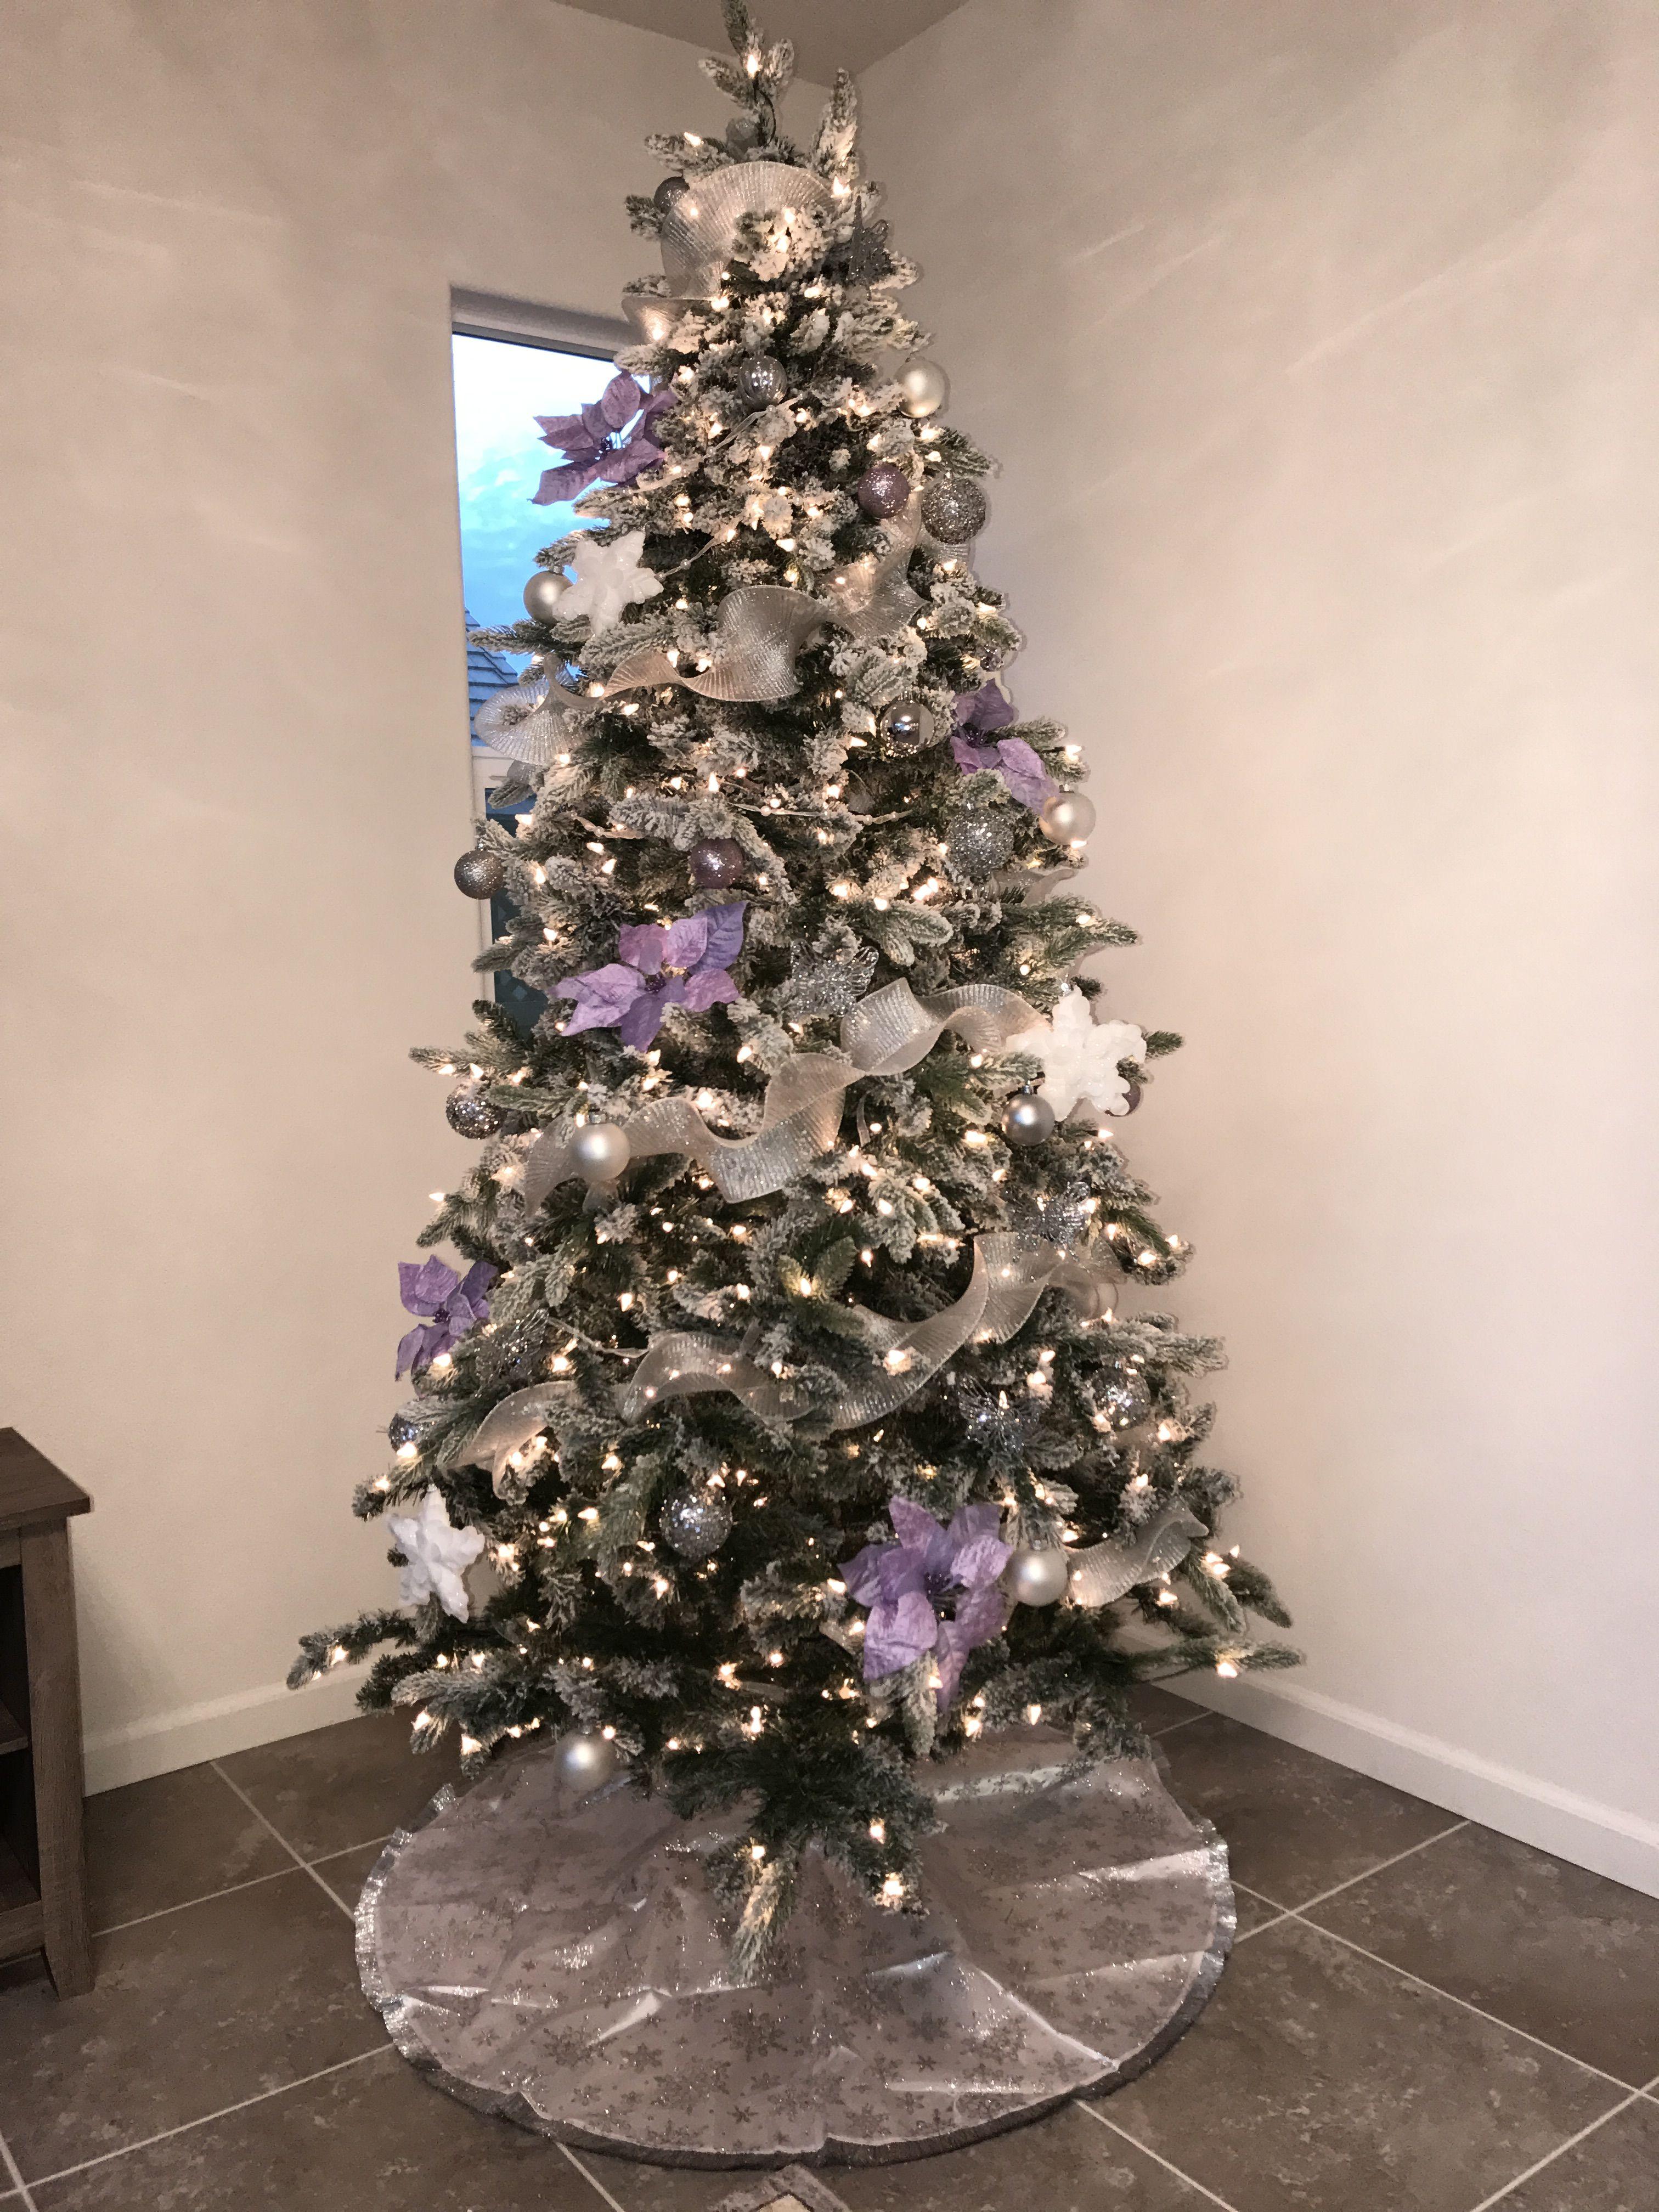 Lavender Christmas Tree Christmas Glam Rose Gold Ornaments Christmas Purple Christmas Decorations Christmas Tree Design